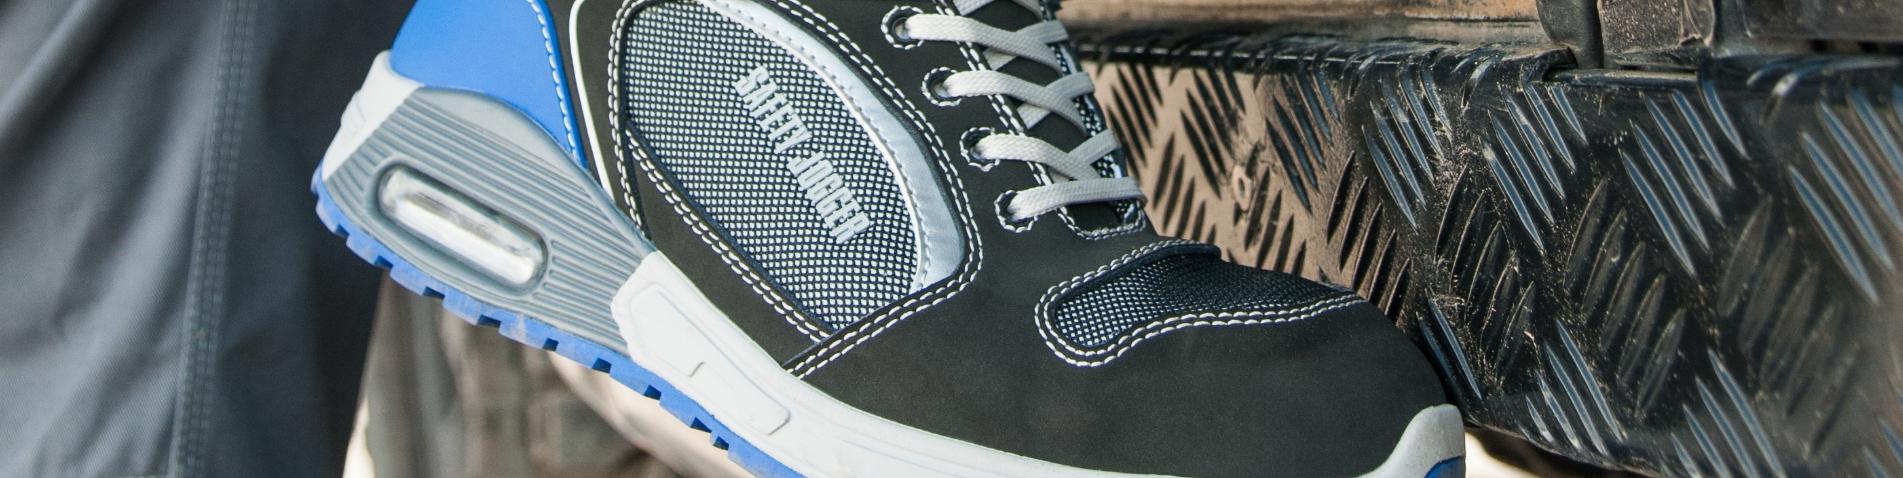 Werkschoenen Achteraf Betalen.S1 S1p Werkschoenen Kopen